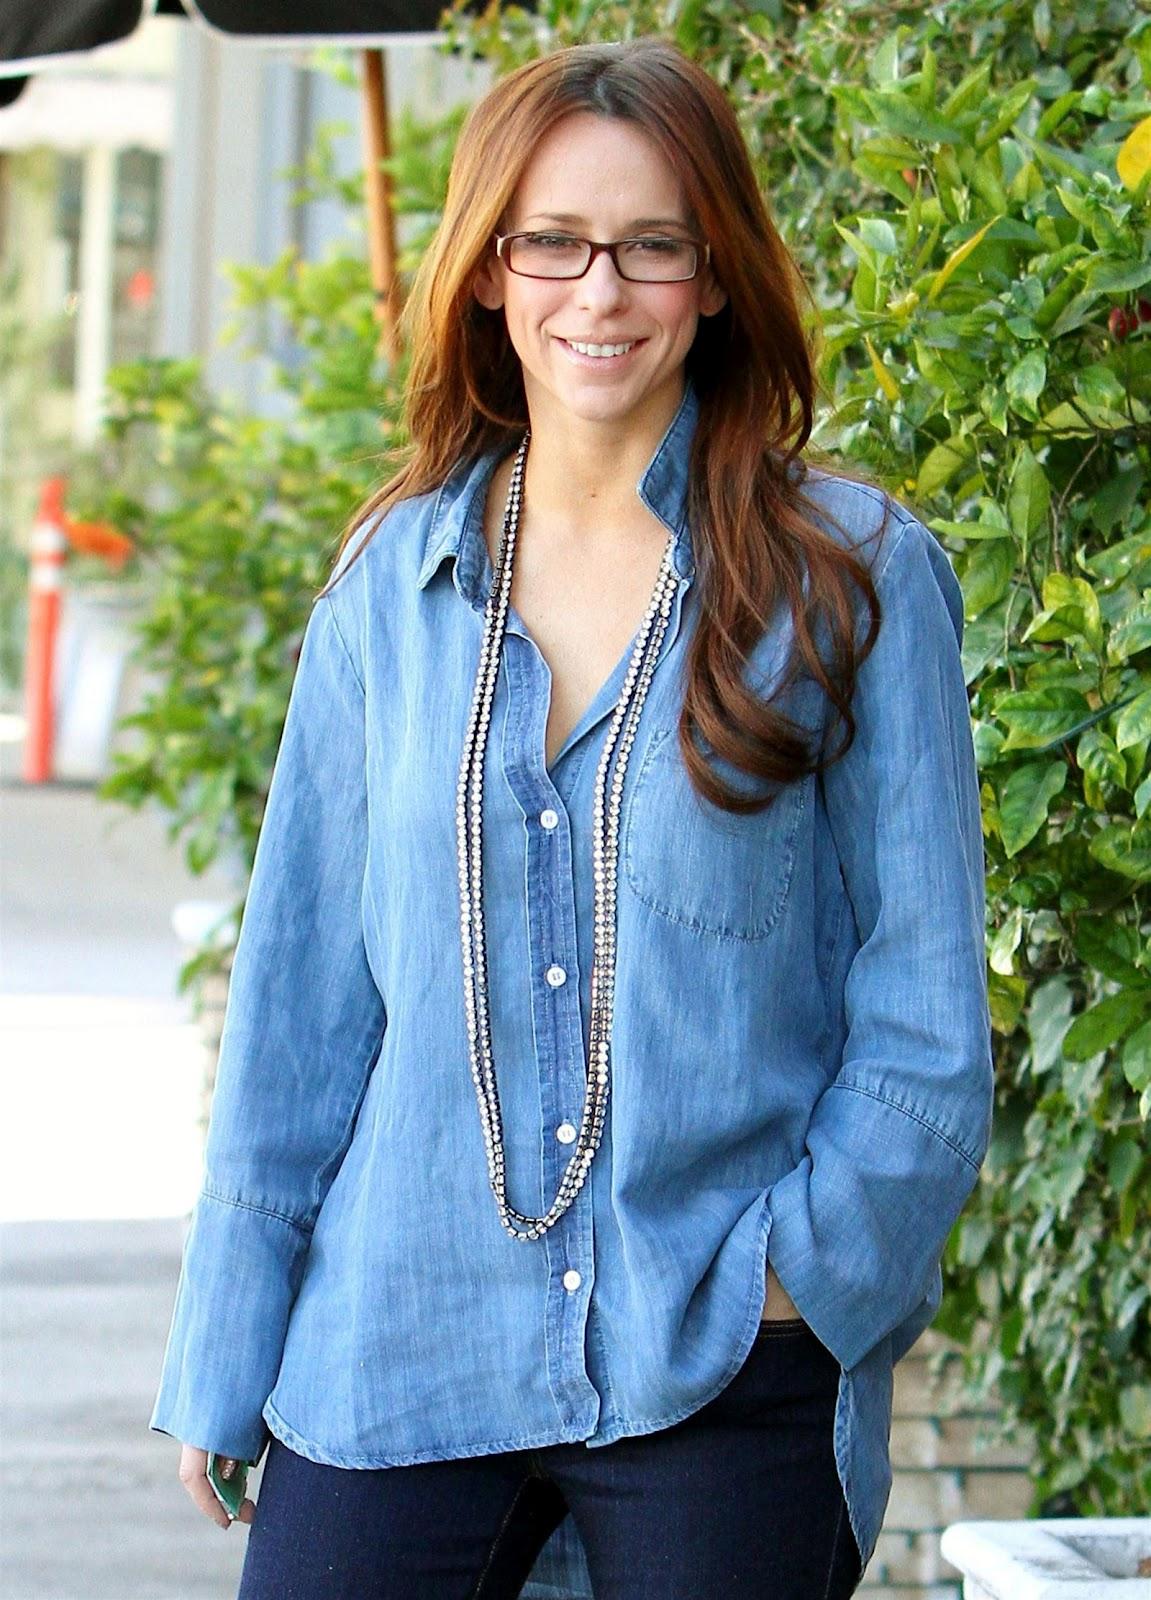 http://1.bp.blogspot.com/-xlAlhEom538/T4TqB1_nakI/AAAAAAAARQM/hiHtTPmNj7M/s1600/Jennifer+Love+Hewitt-5.jpg